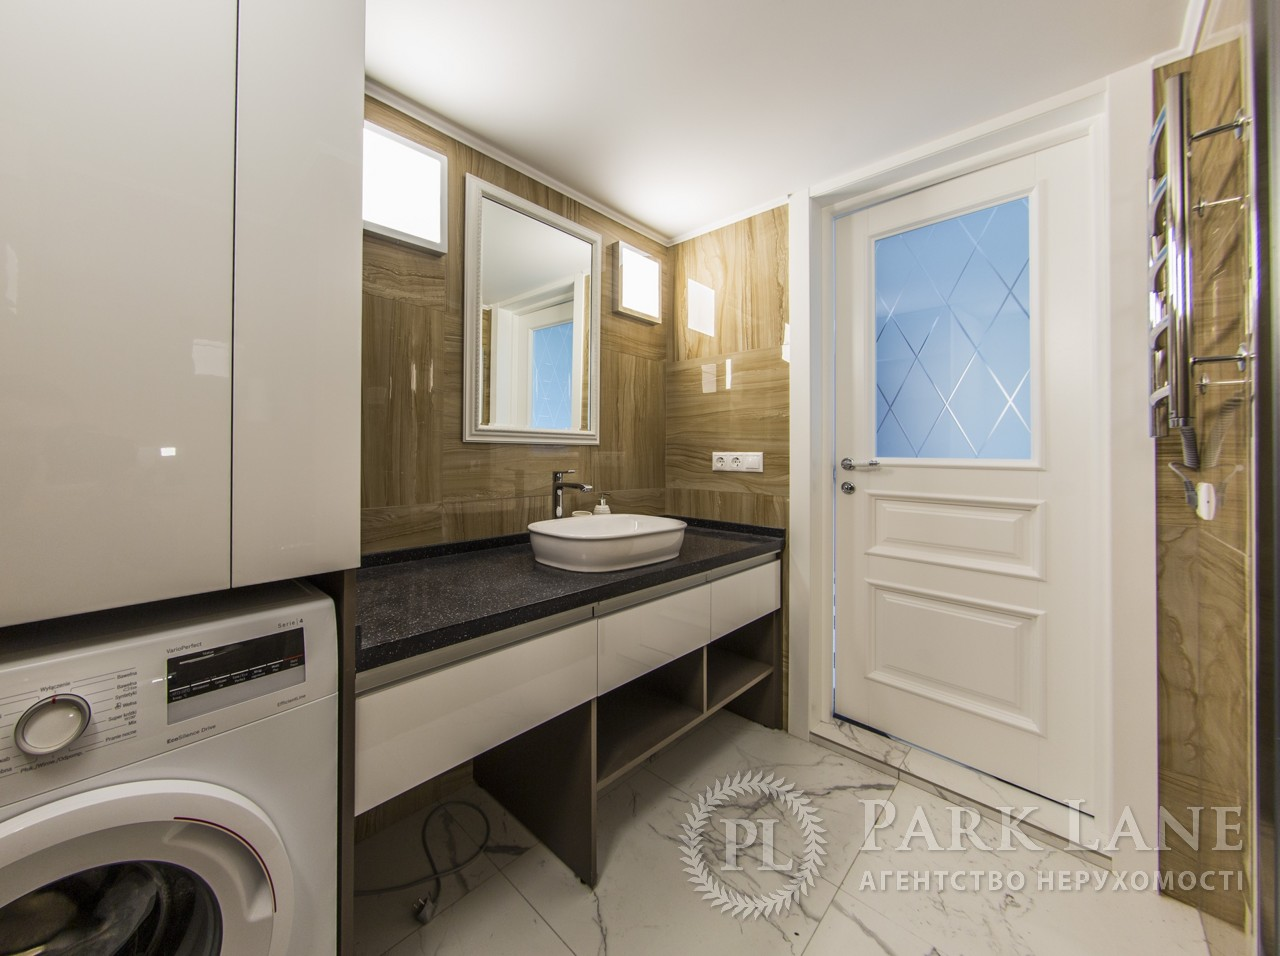 Квартира ул. Владимирская, 40/2, Киев, J-25880 - Фото 25